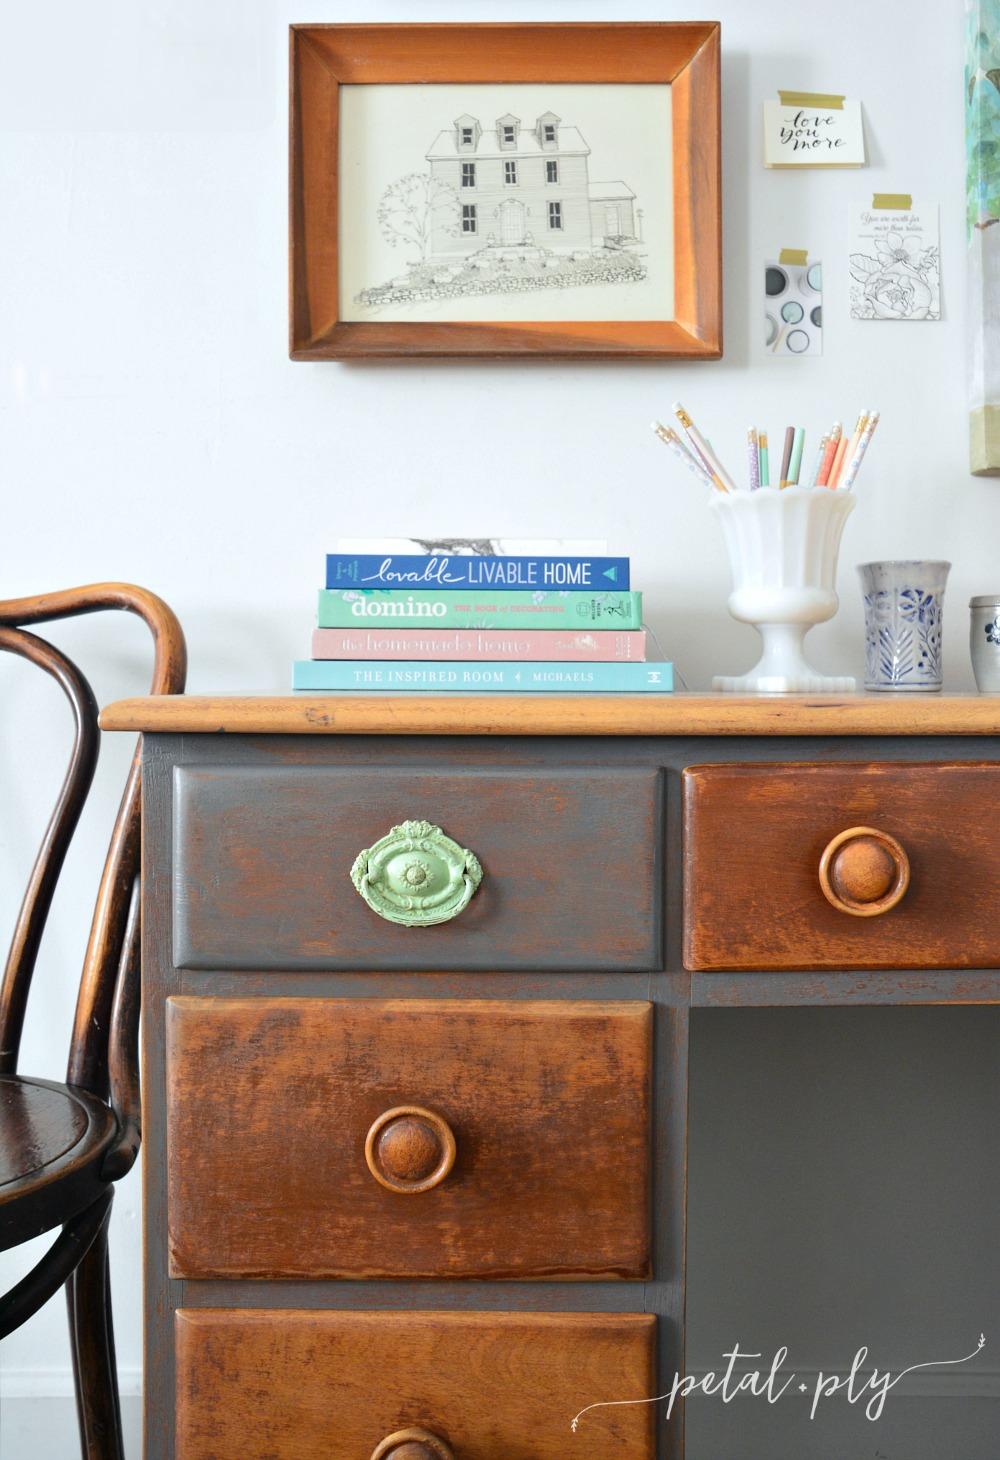 wm-general-finishes-milk-paint-driftwood-desk-redo